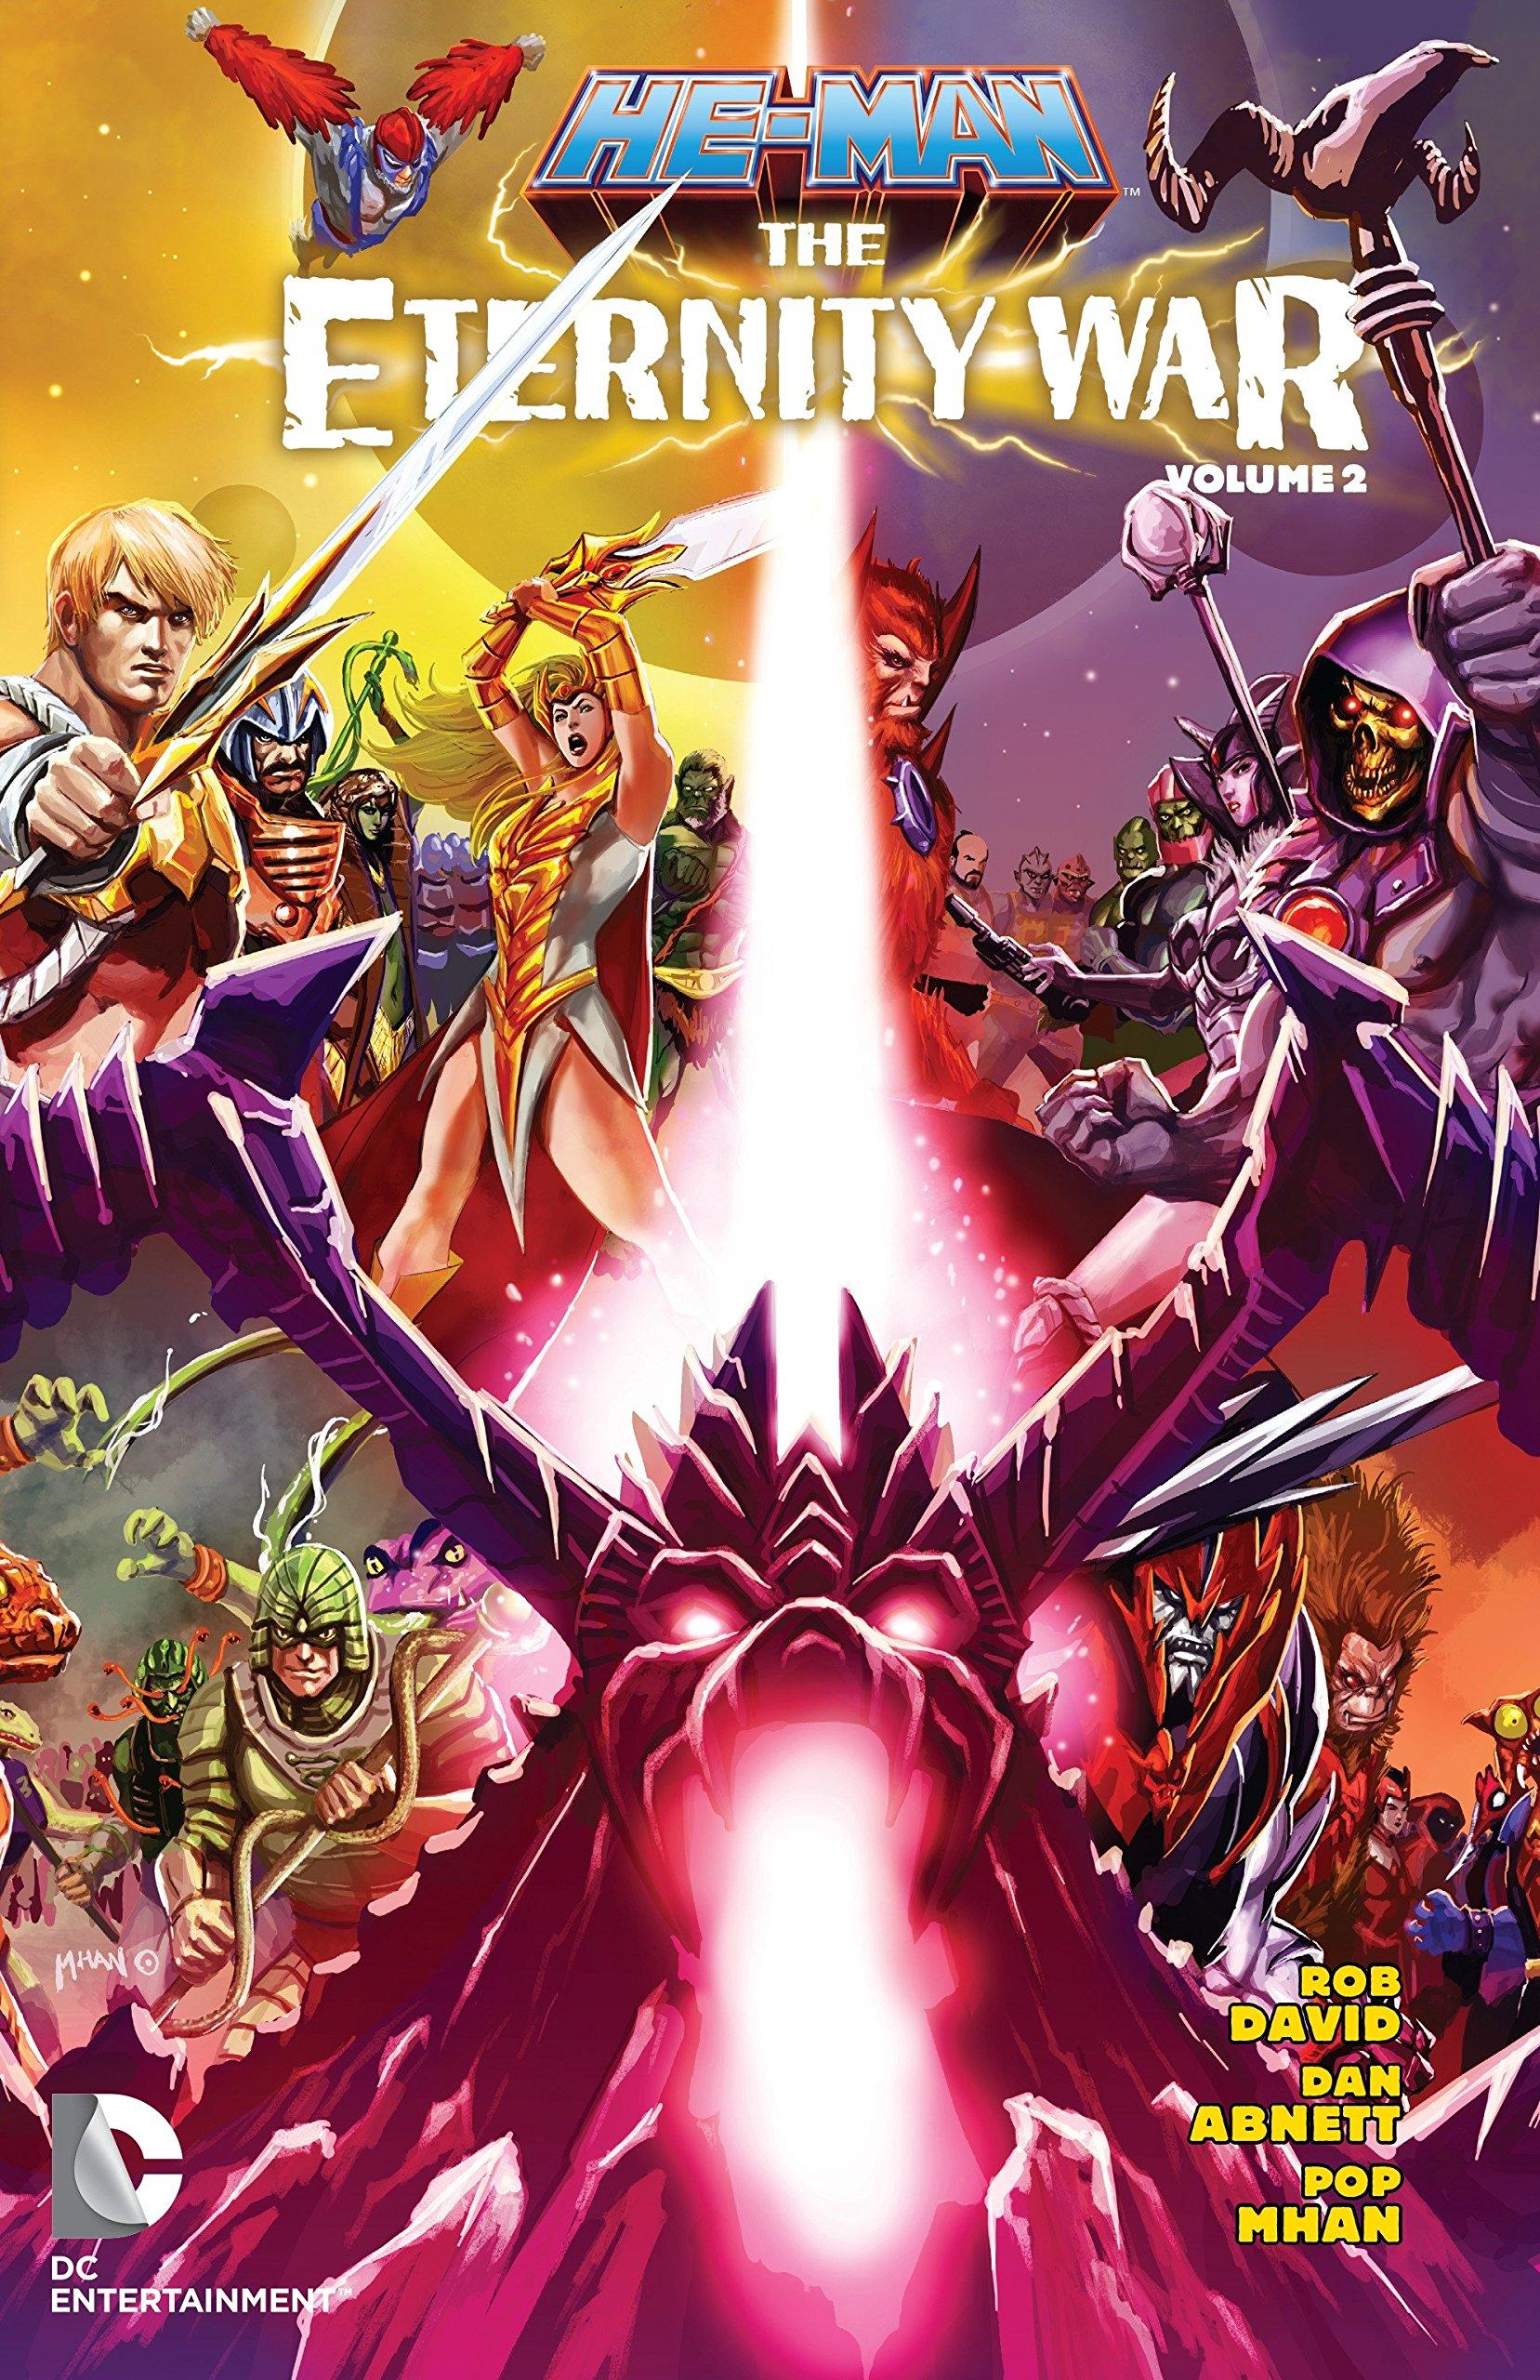 He-Man: The Eternity War, Vol. 2